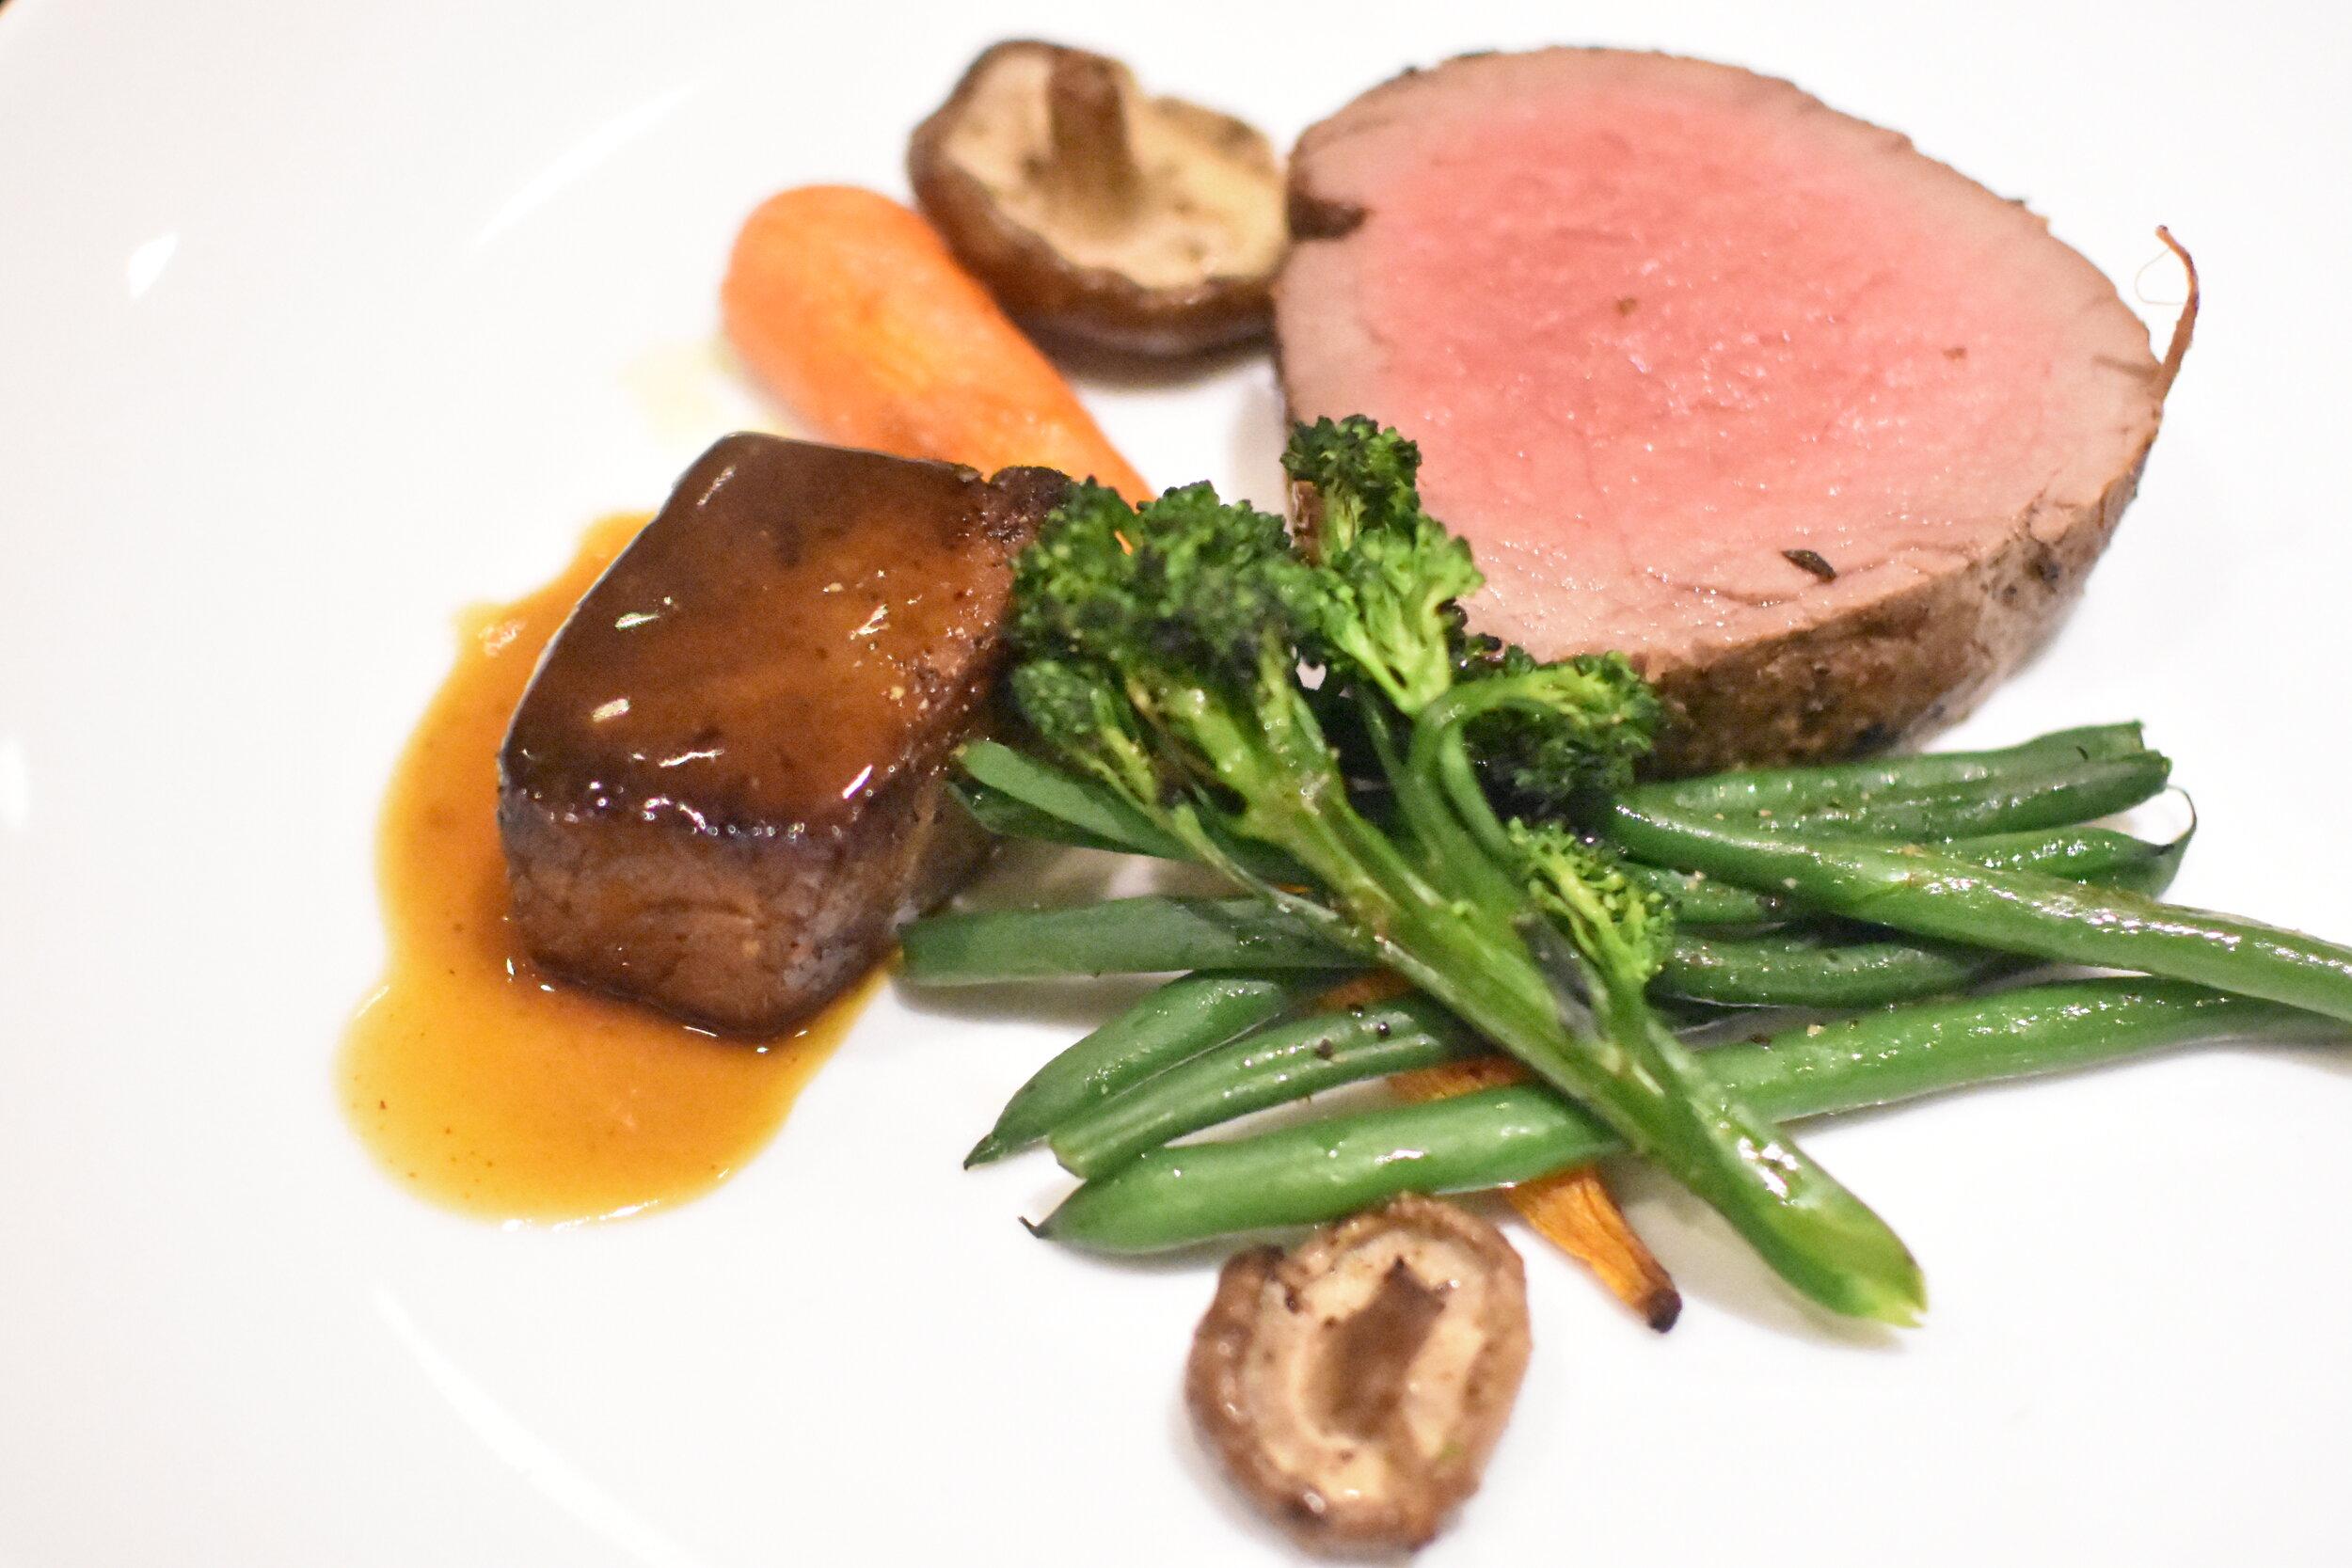 ChefGary Dinner party - British Beef